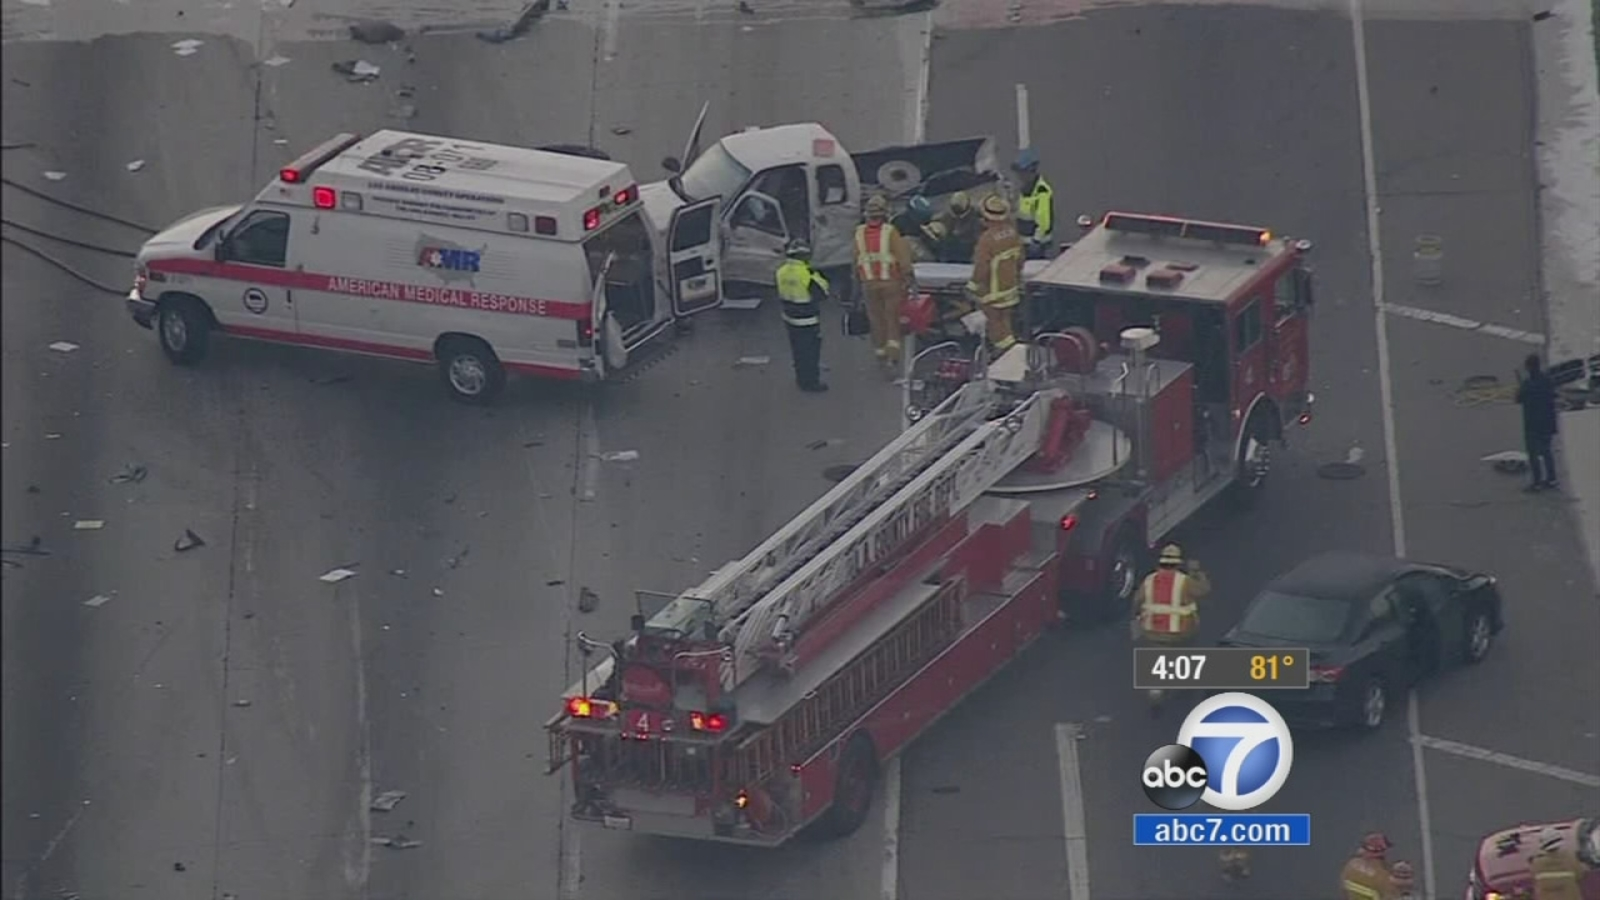 60 Freeway Crash In South El Monte 5 Year Old Girl Killed